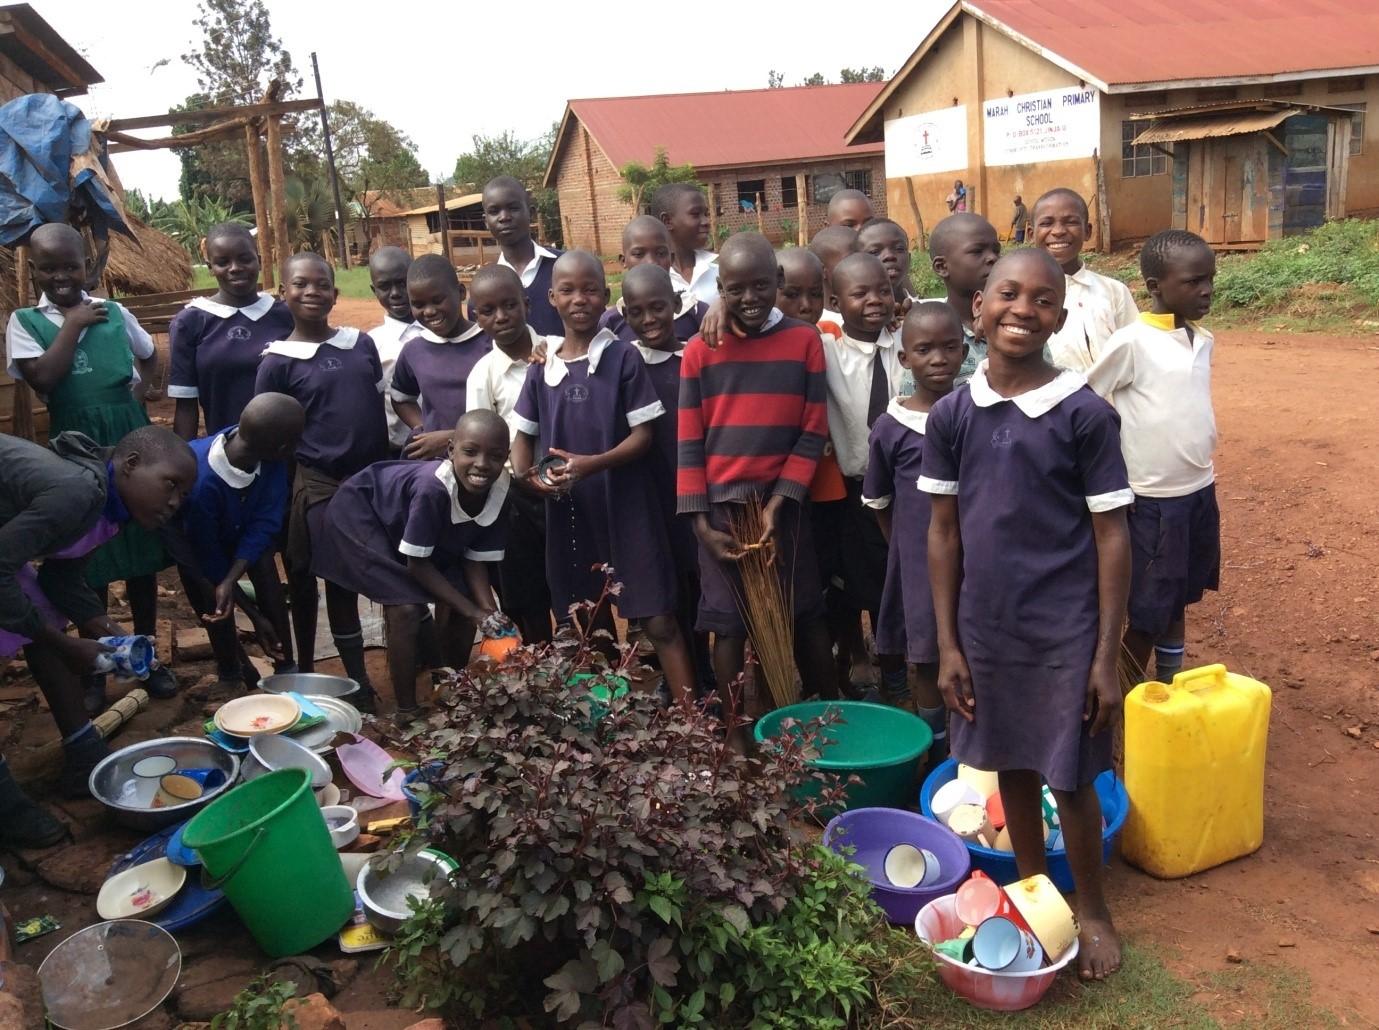 student-outreach-team-serving-the-community-uganda